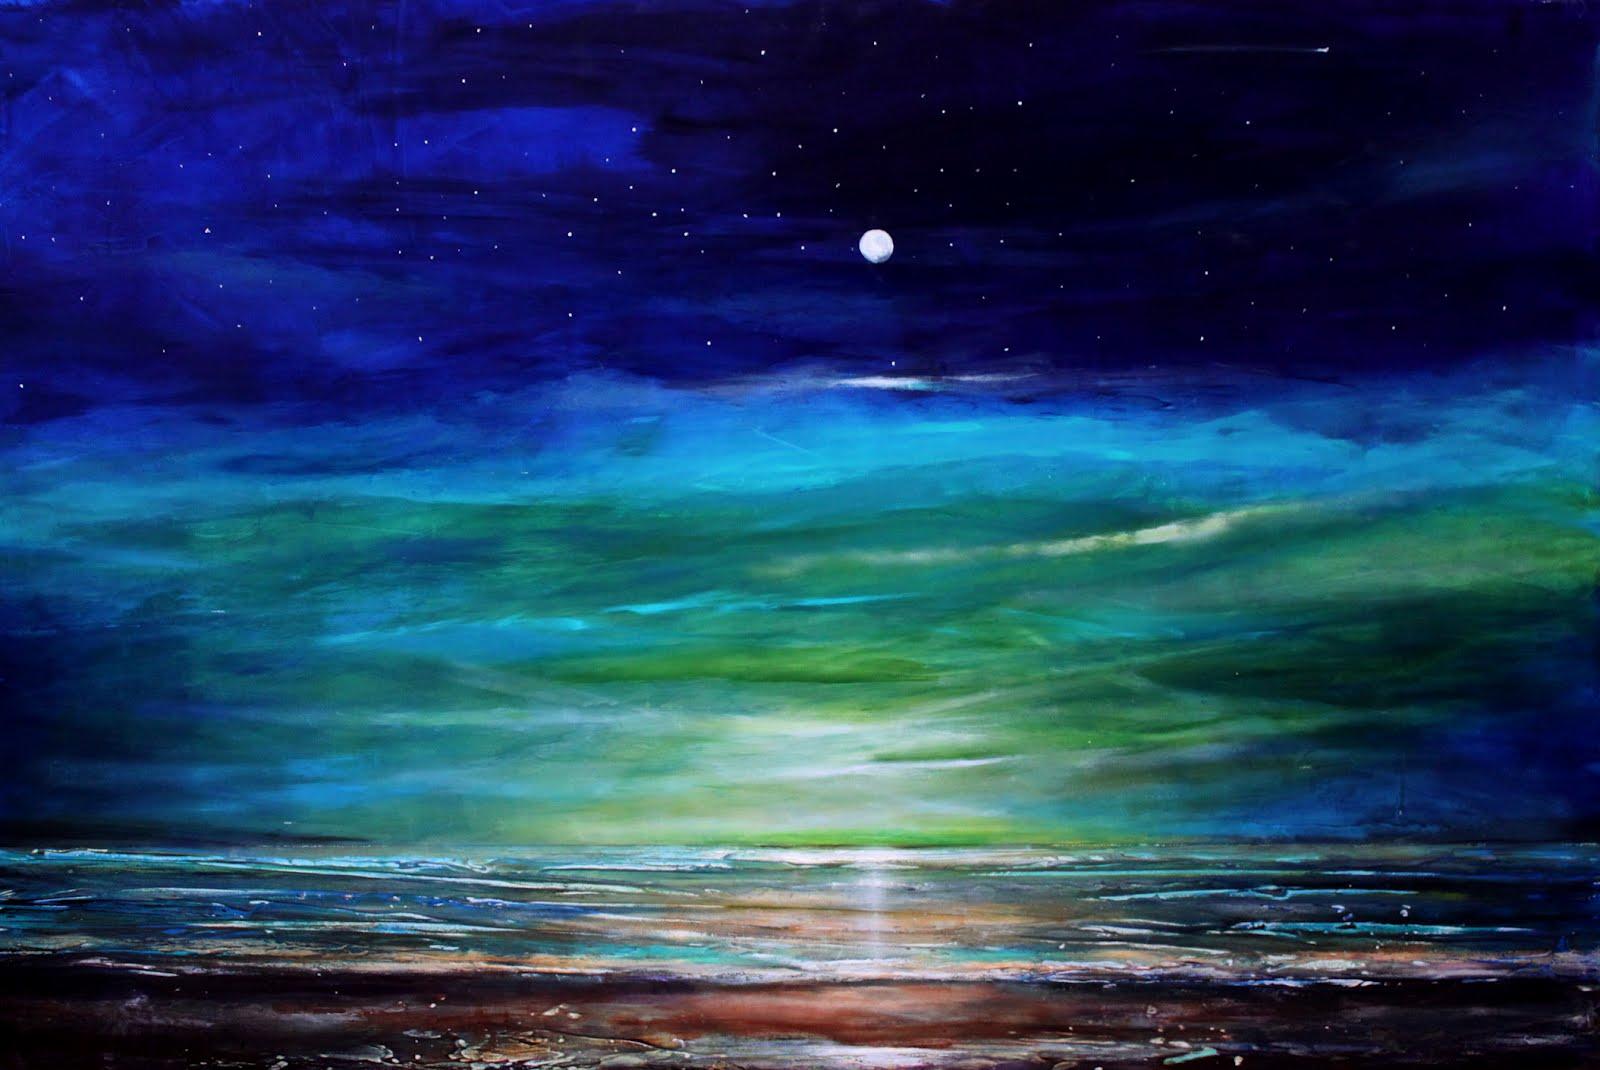 Beach at Night Painting